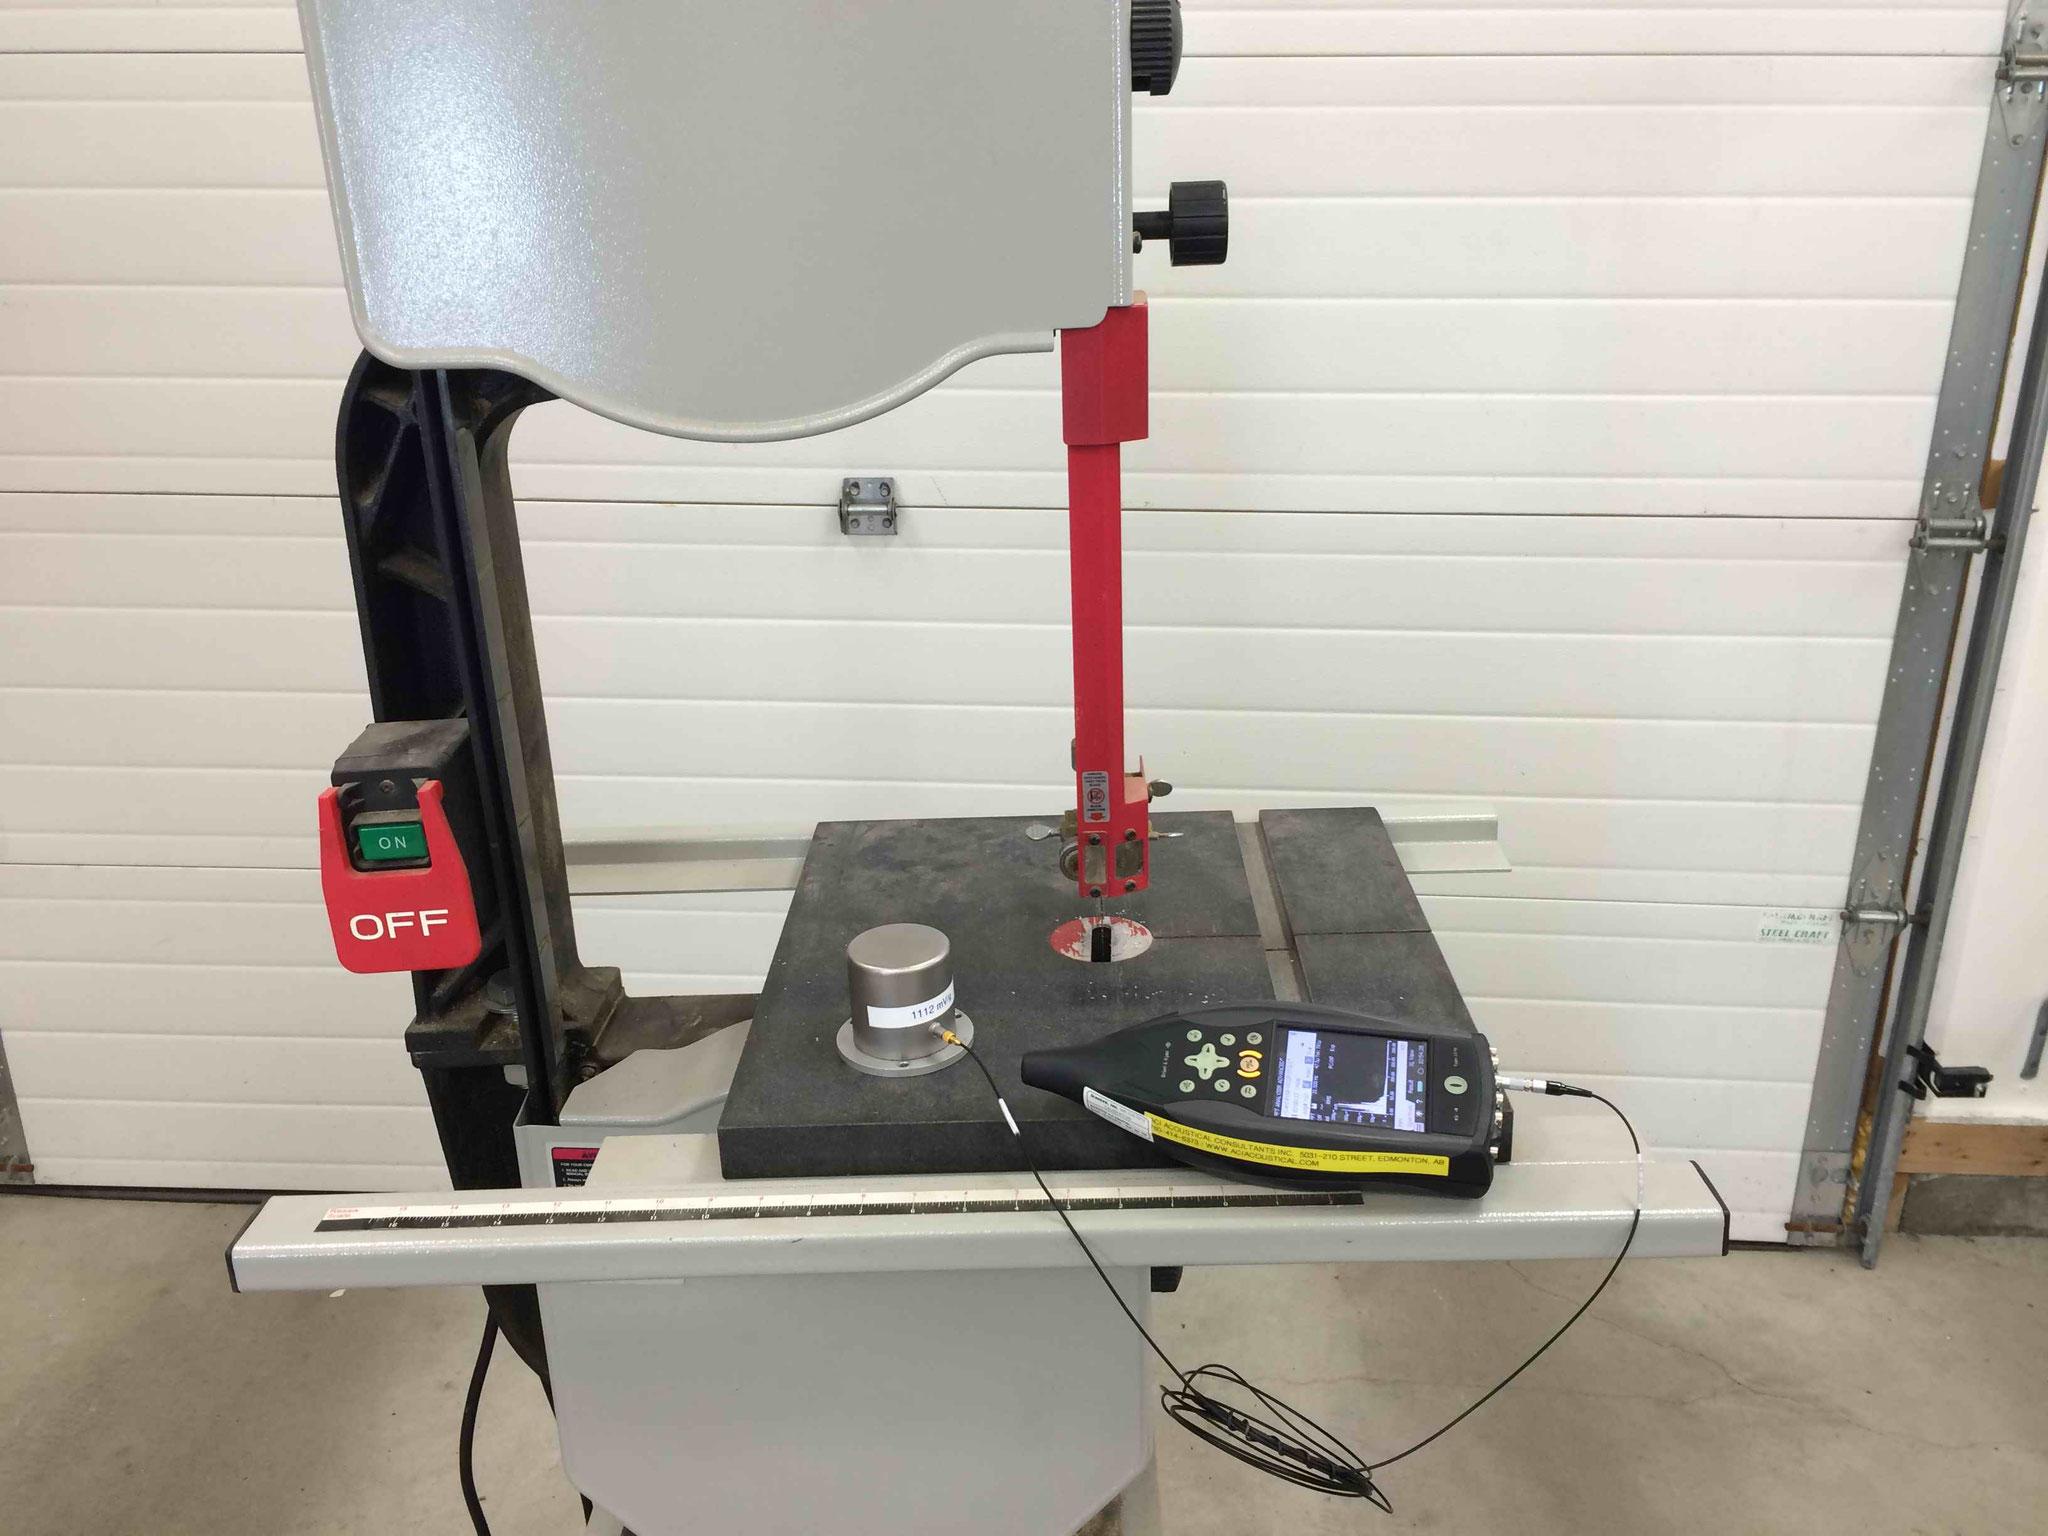 Vibration Measurement of Bandsaw